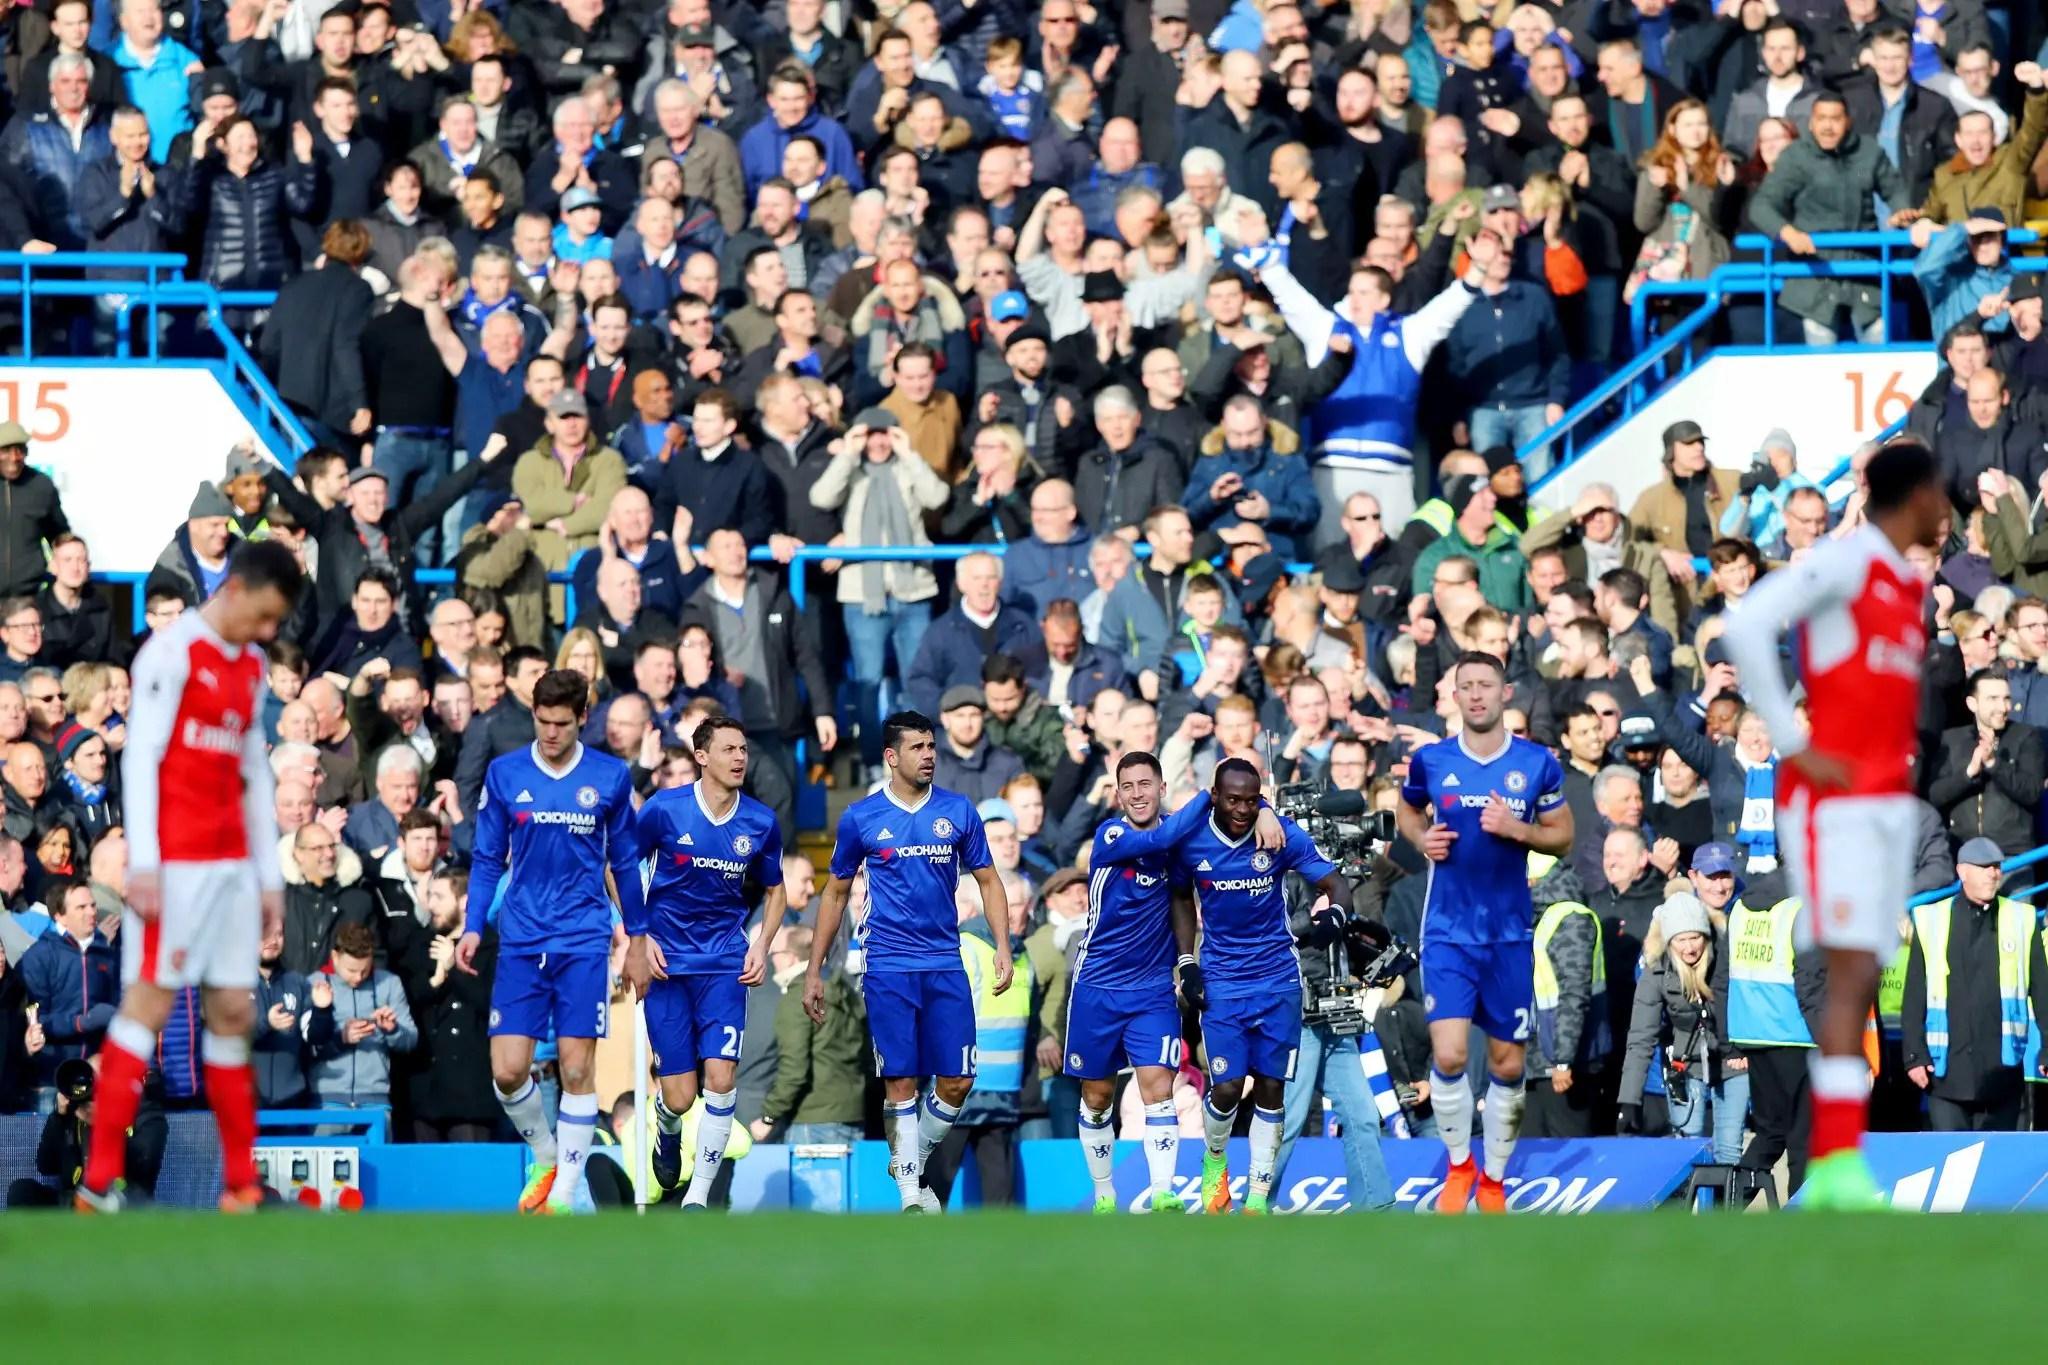 Moses Hails 'Massive' Chelsea Win Over Arsenal